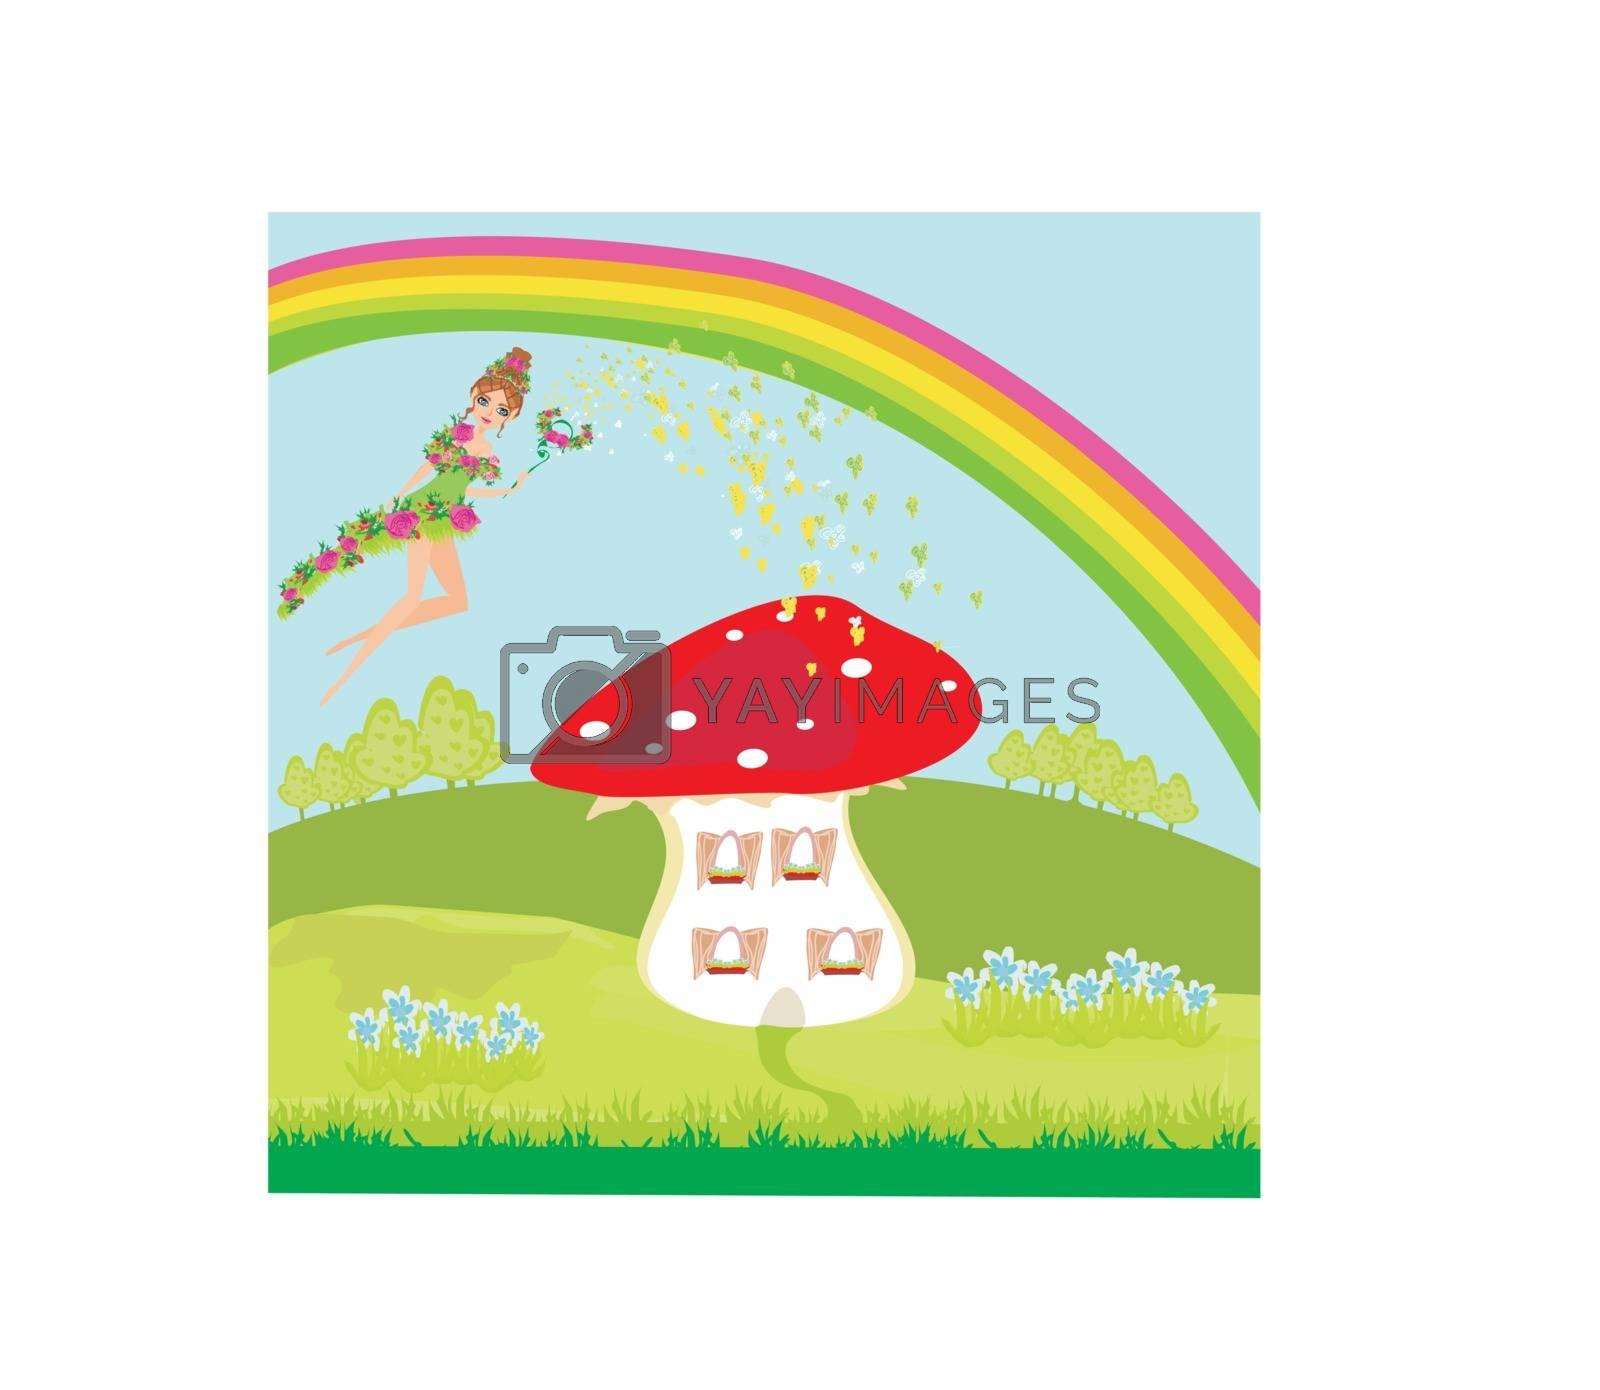 Royalty free image of funny cartoon mushroom house and beautiful fairy by JackyBrown